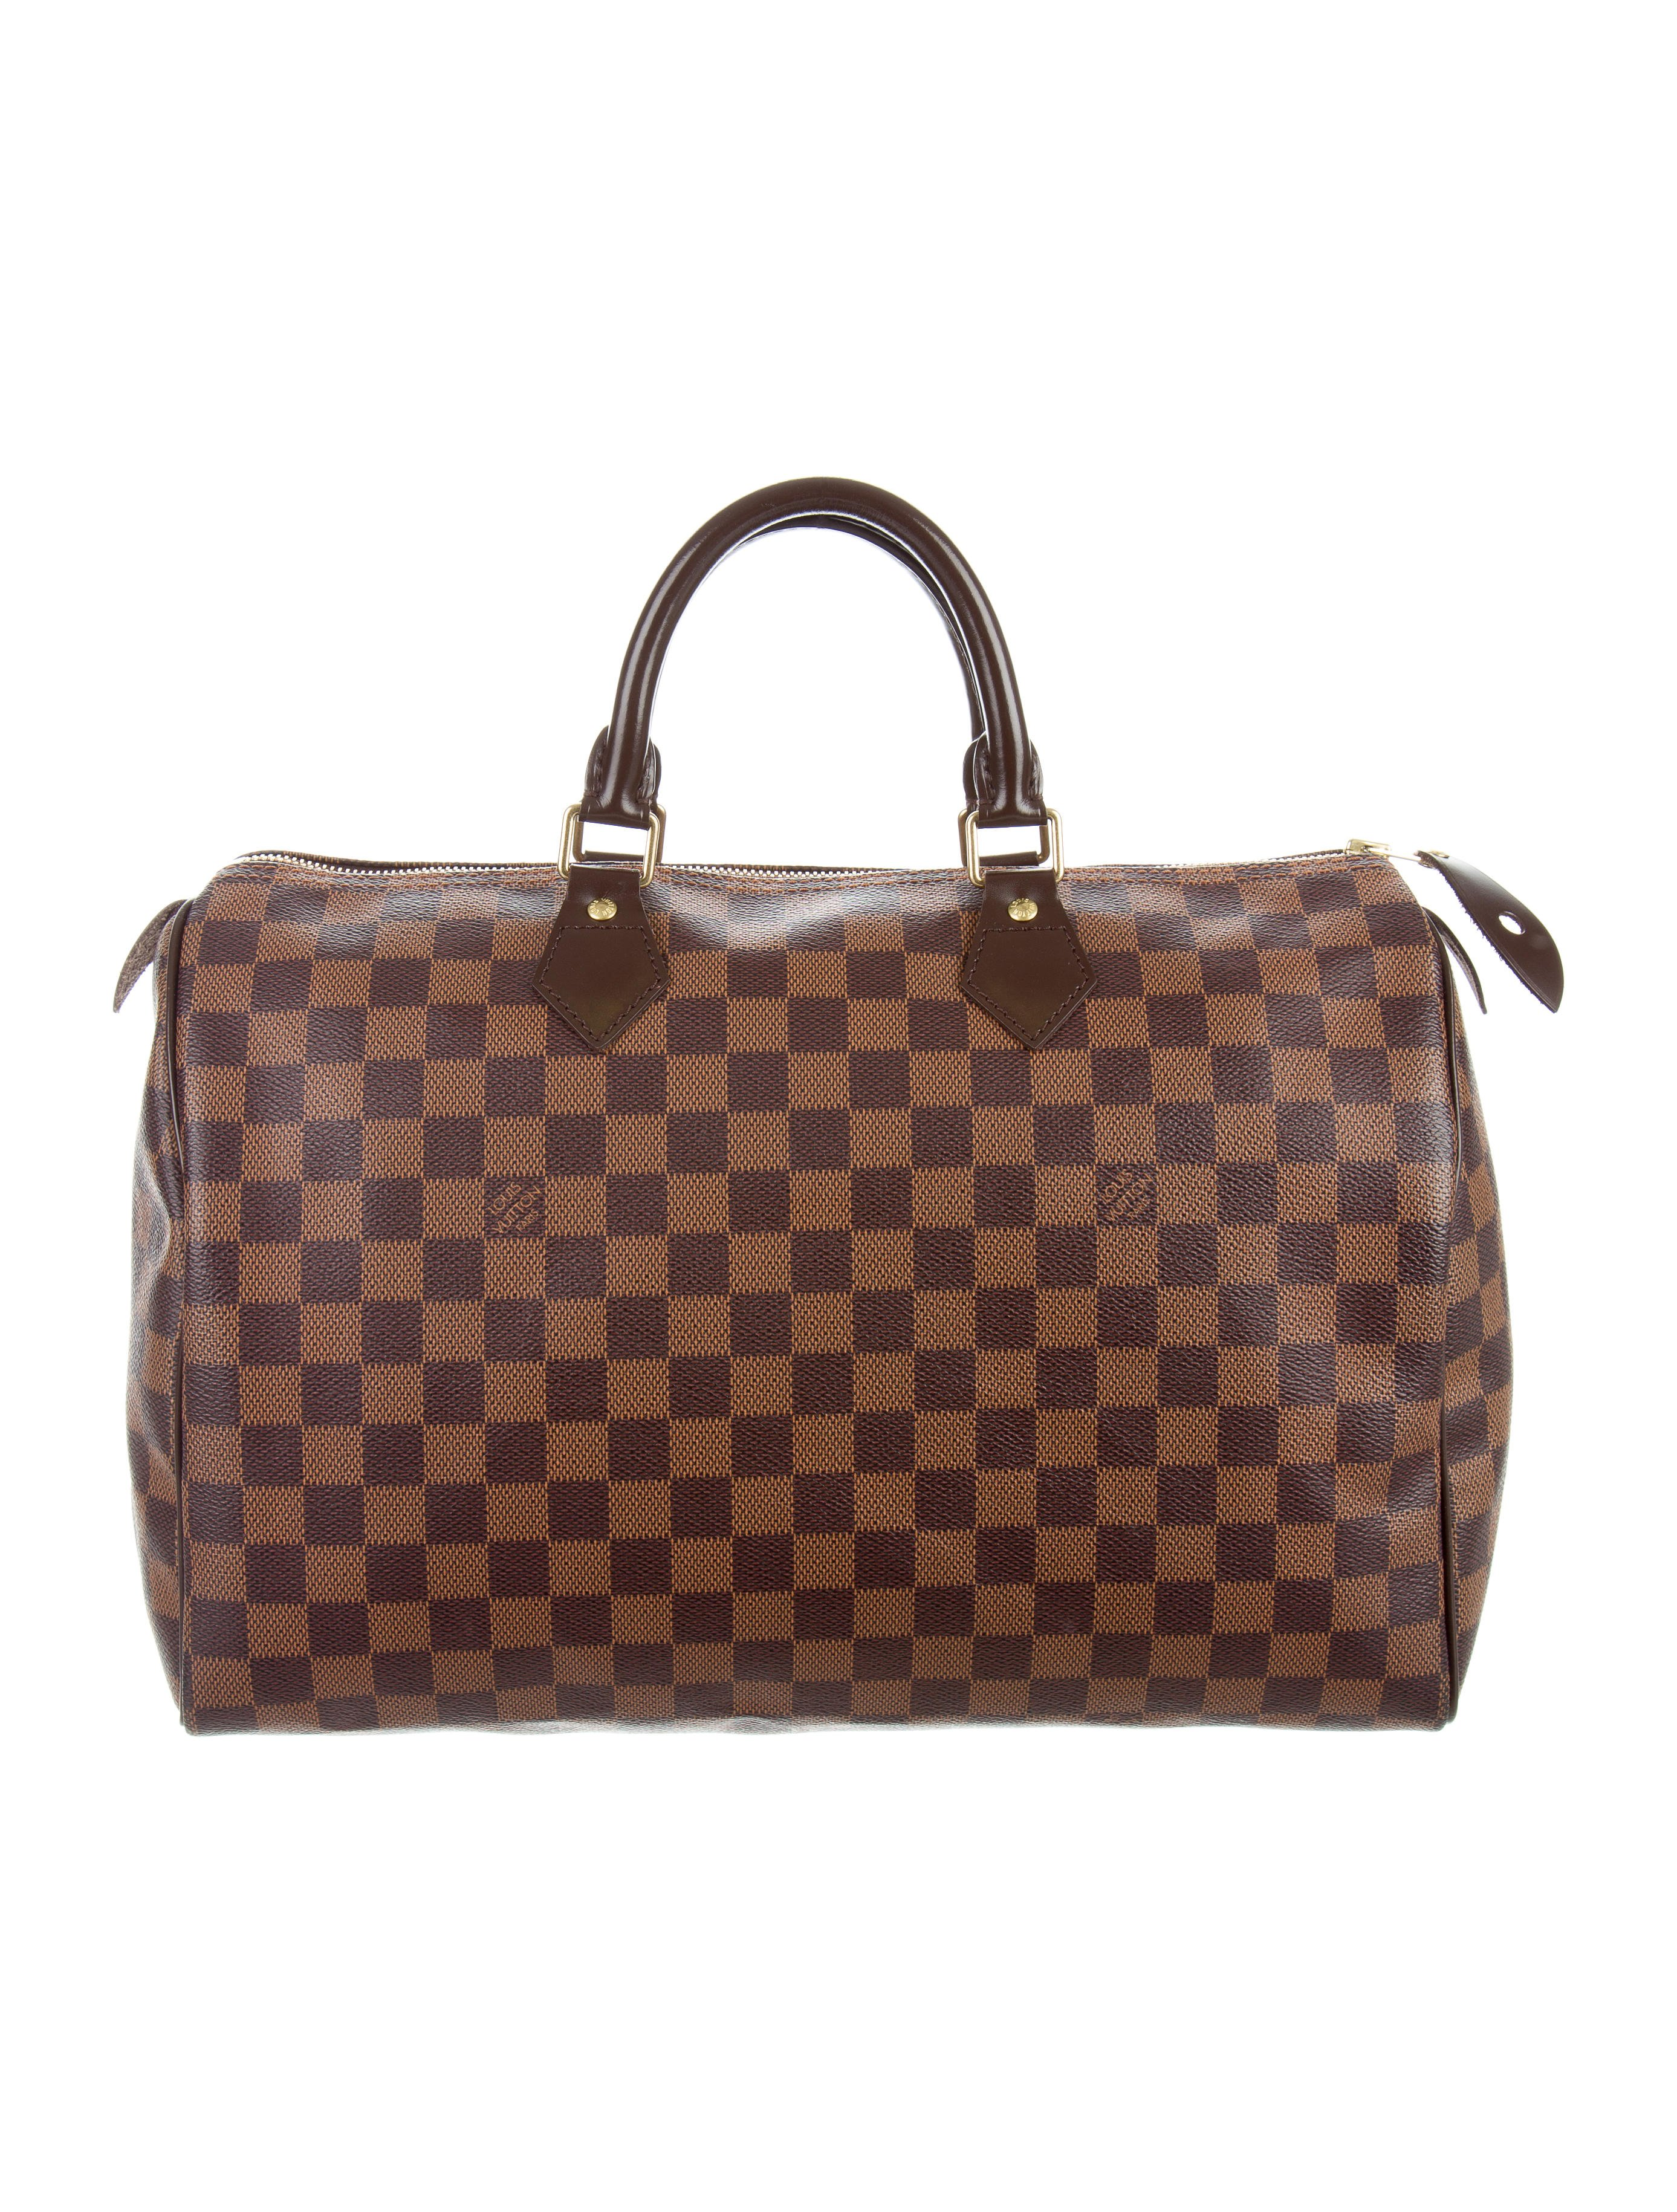 Louis vuitton damier speedy 35 handbags lou115694 for Louis vuitton miroir speedy 35